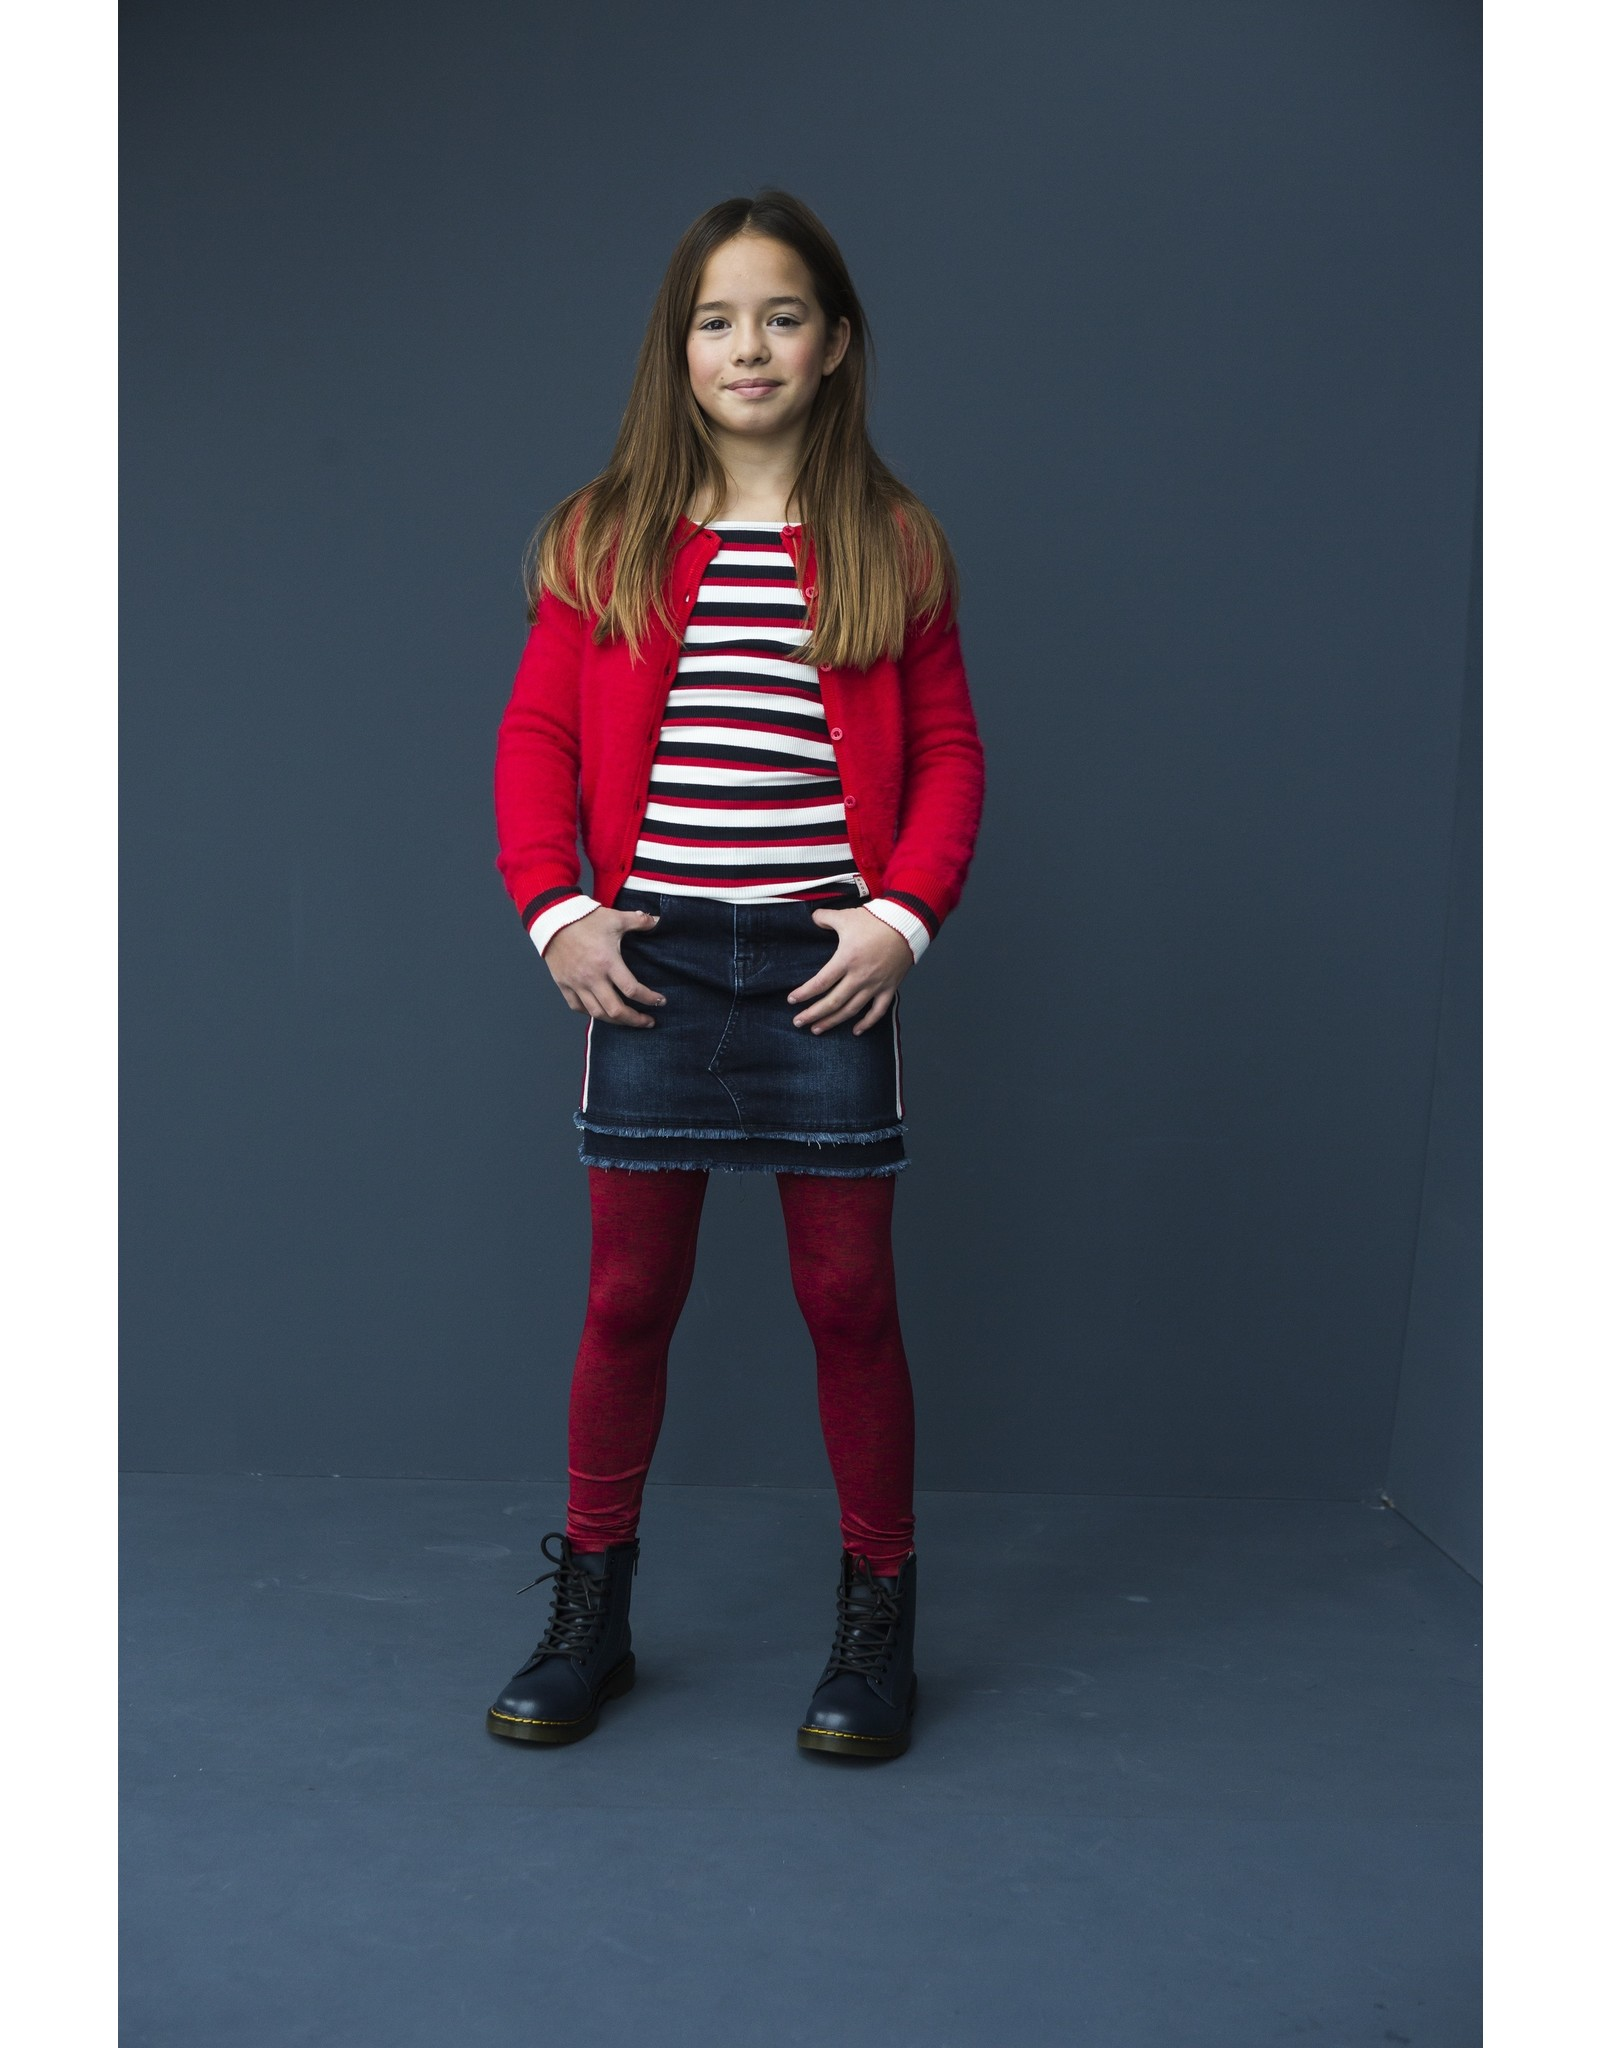 Looxs Revolution Girls Denim skirt